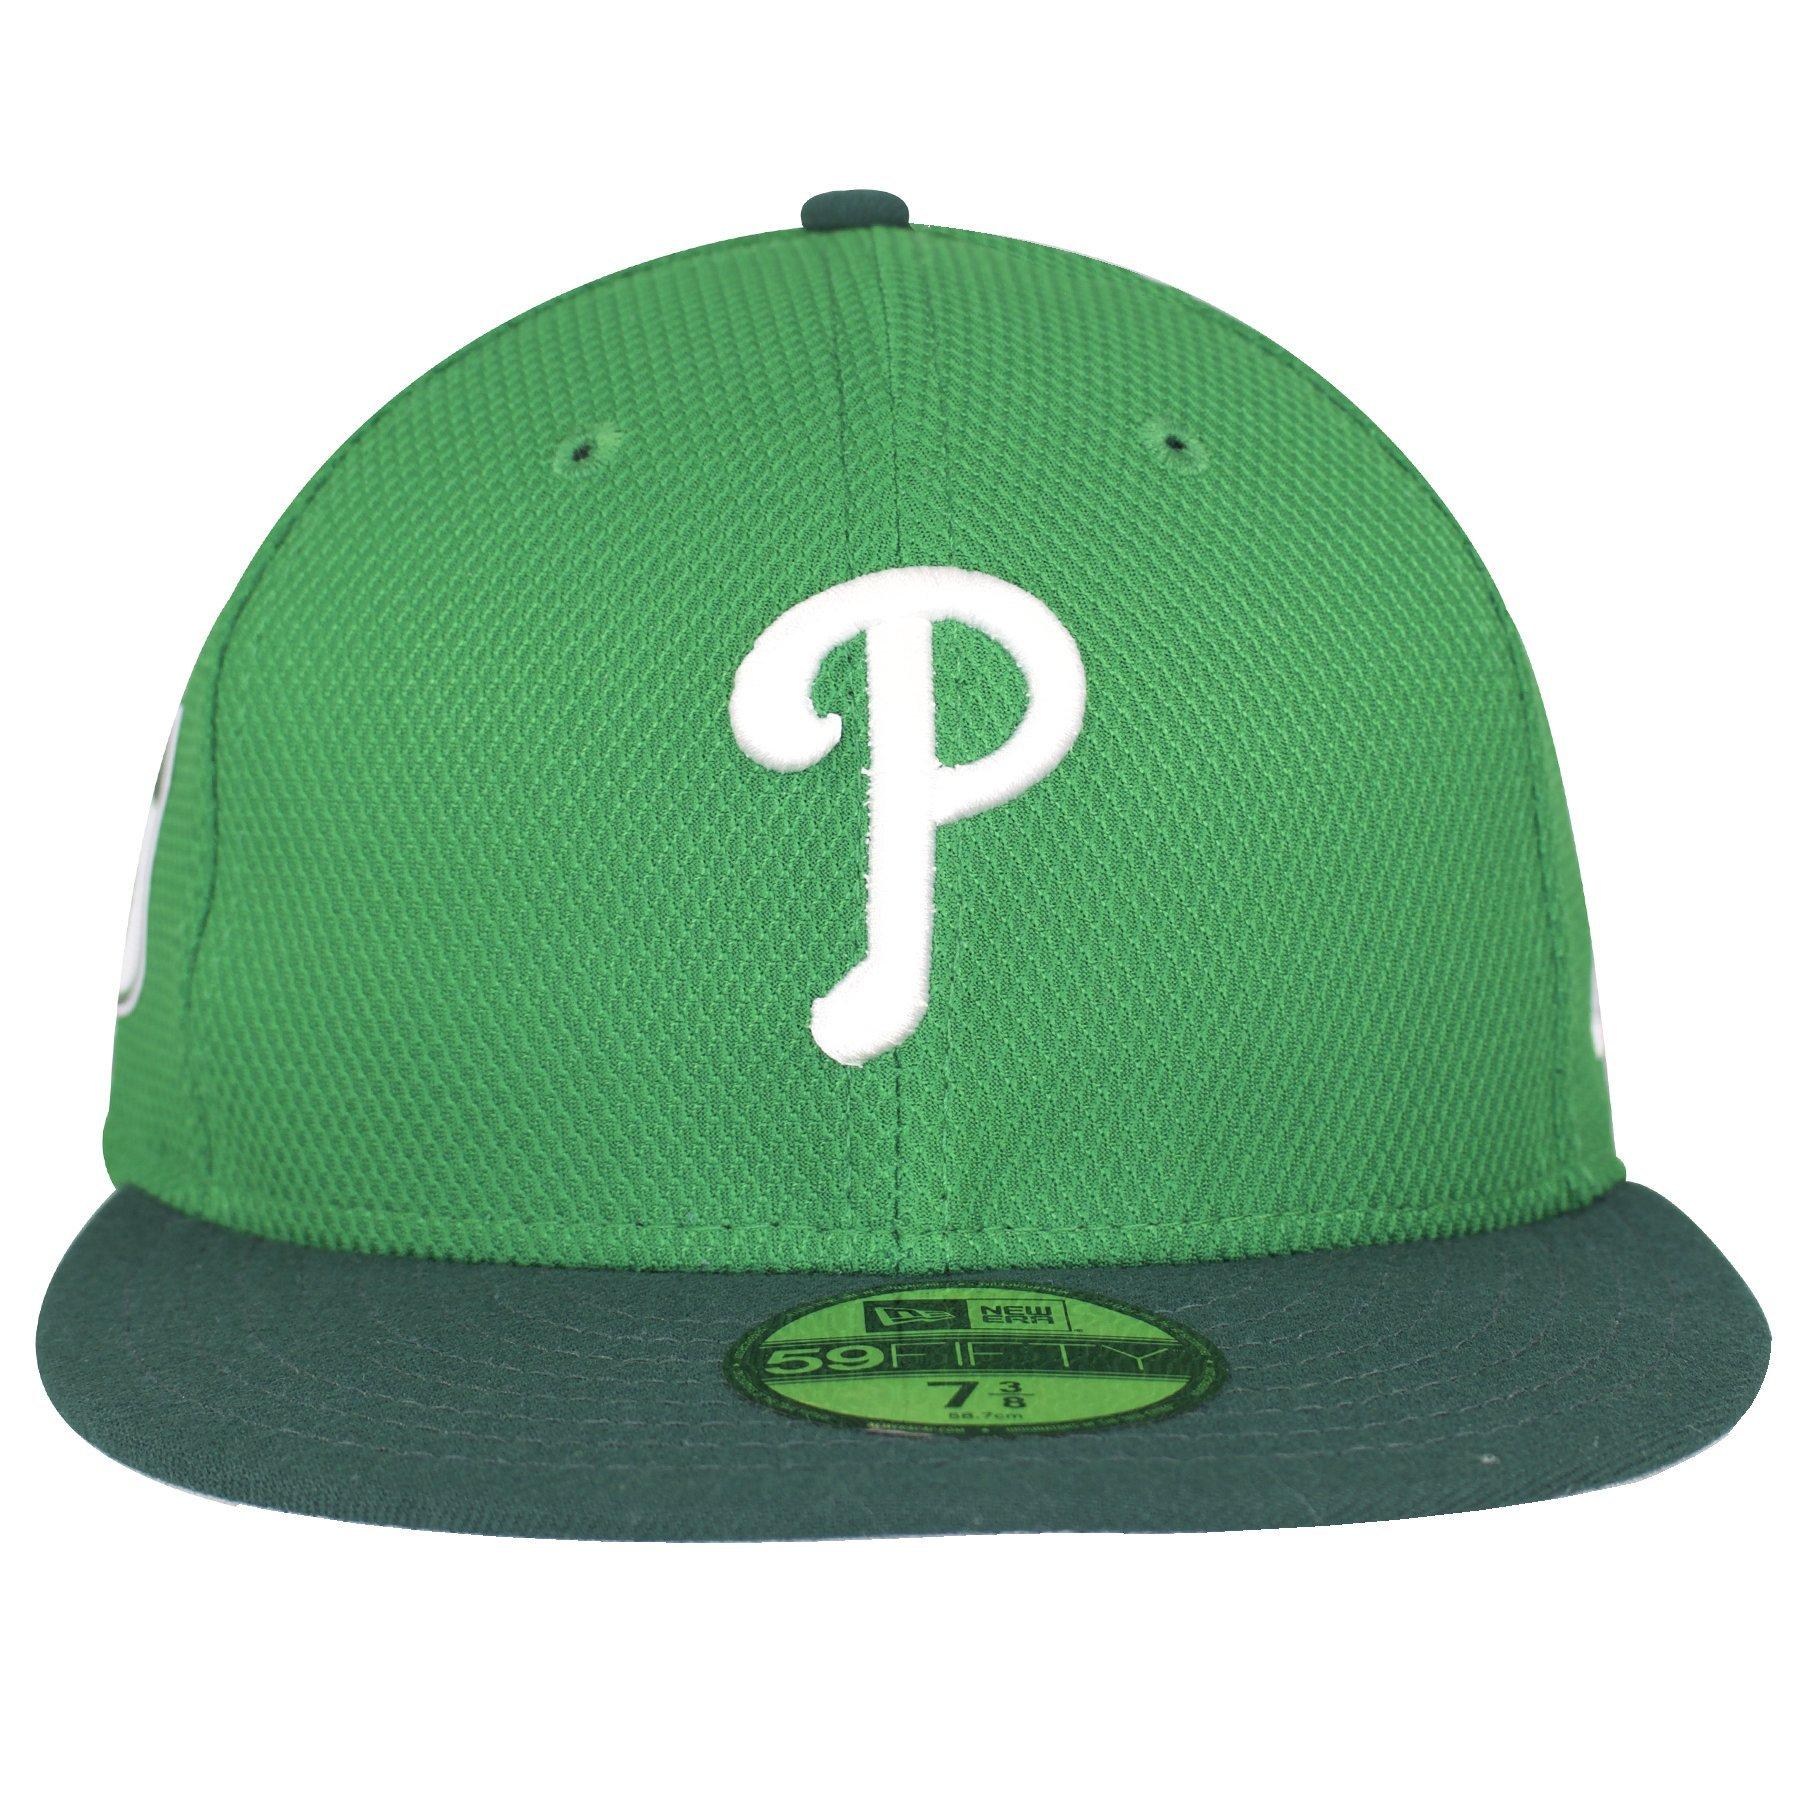 1800x1800 Philadelphia Phillies Irish Green St. Patrick's Day Fitted Cap